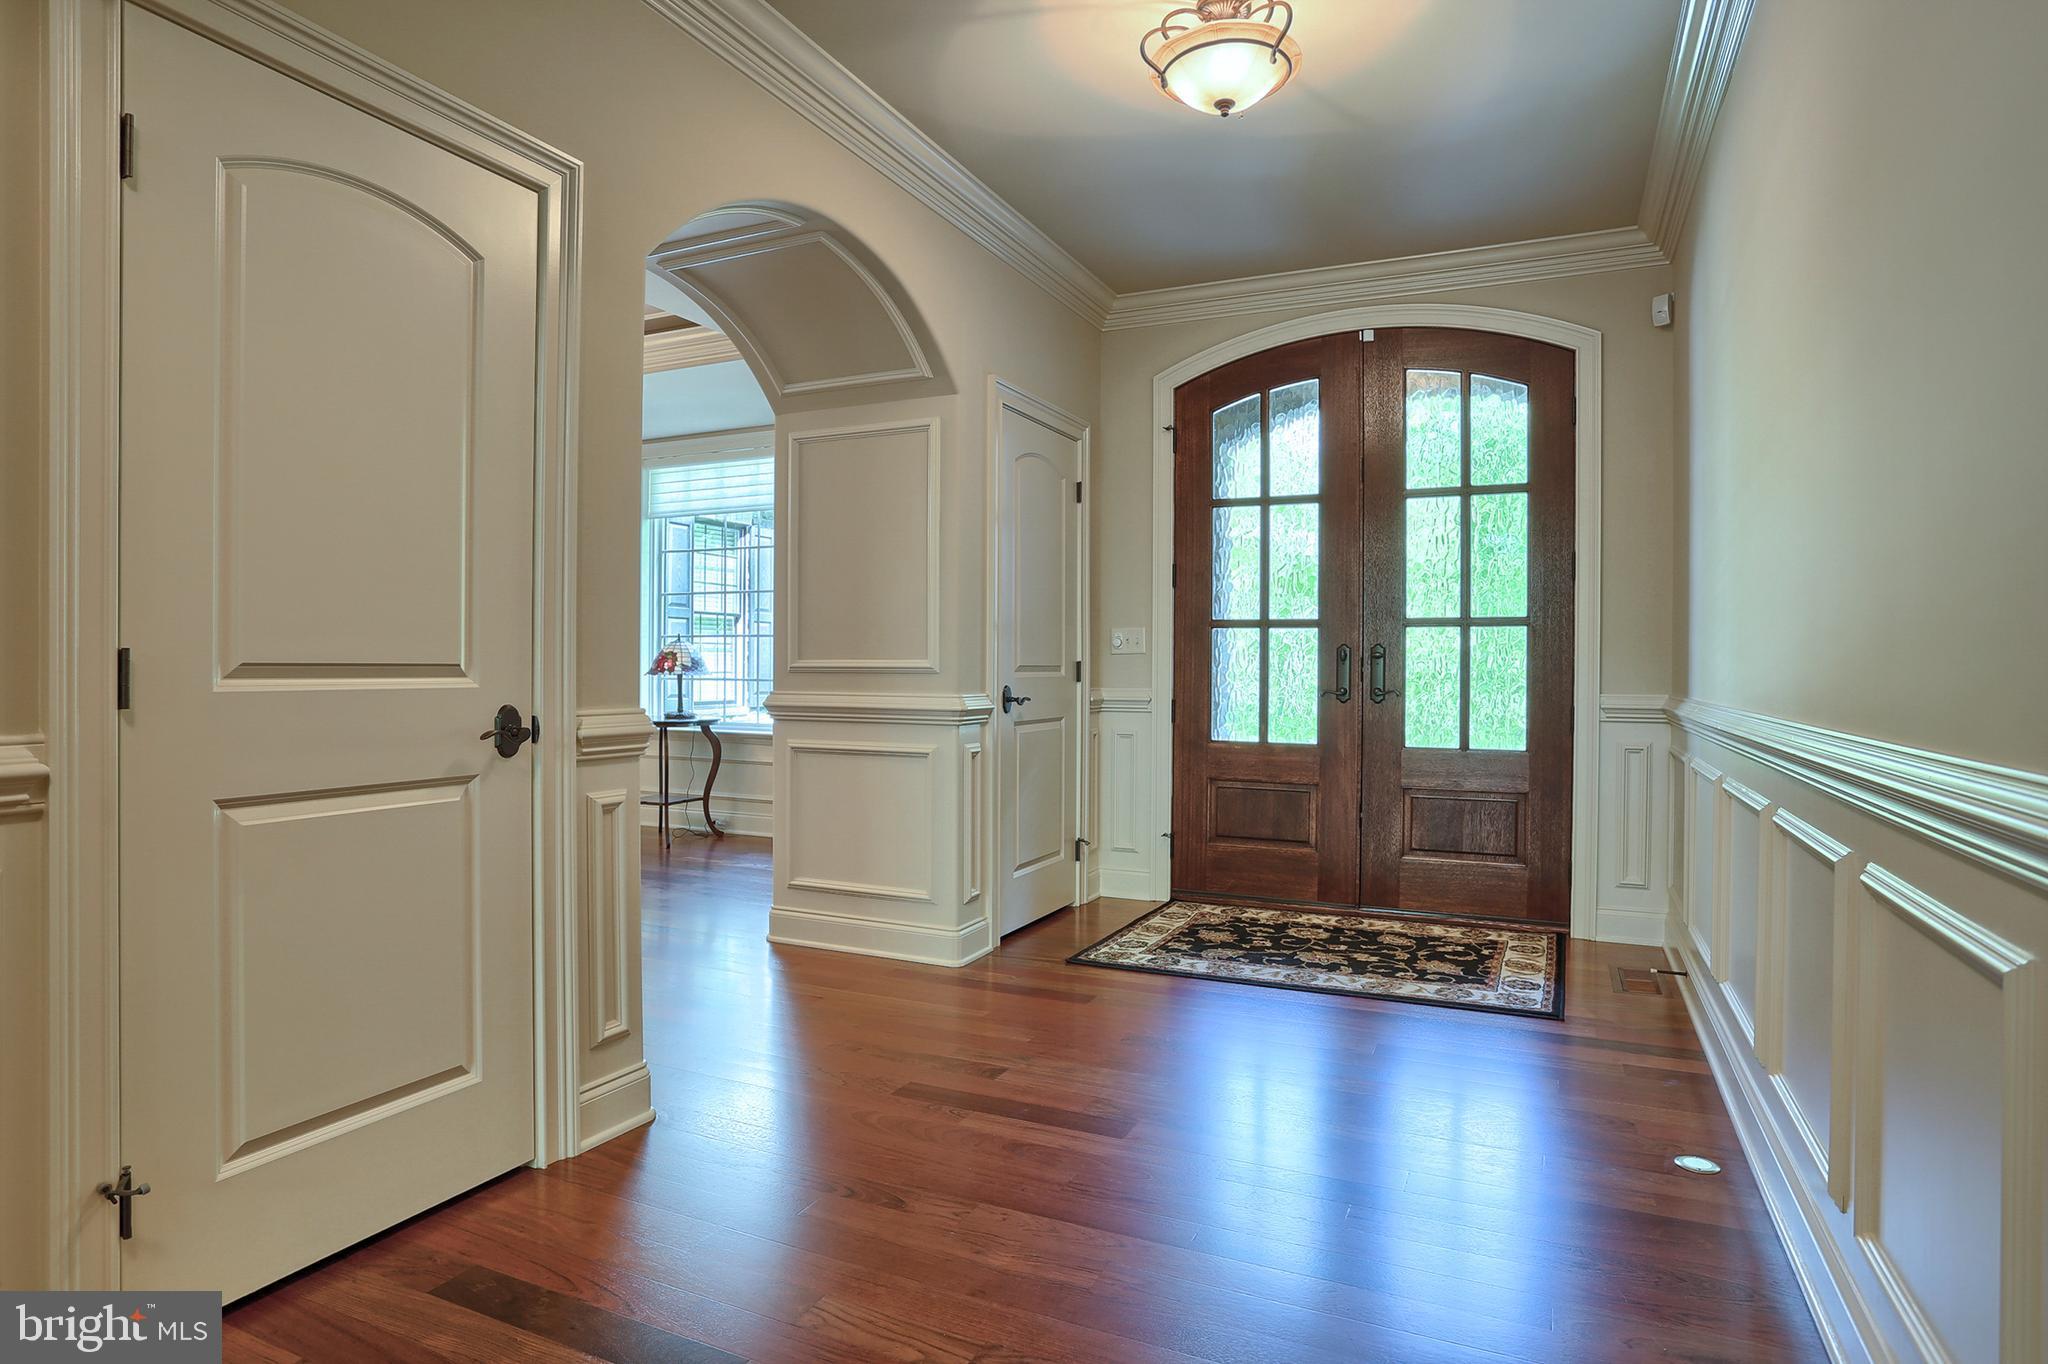 ~8x15  Foyer w dual receiving closets